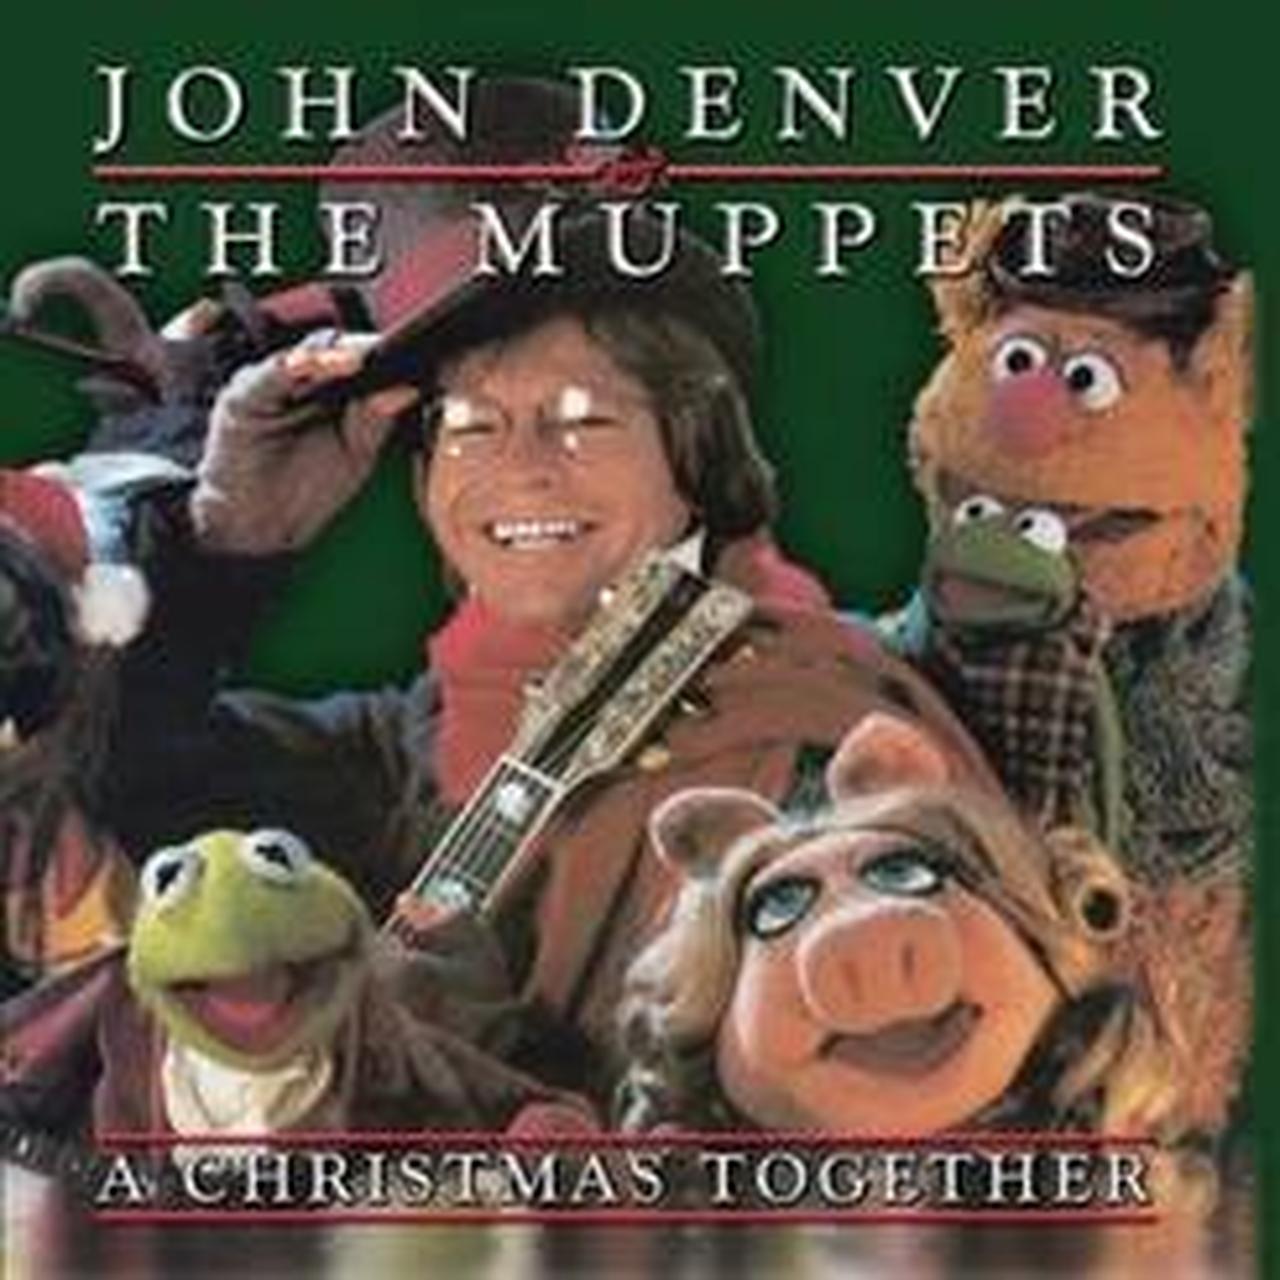 John Denver & Muppets CHRISTMAS TOGETHER Vinyl Record